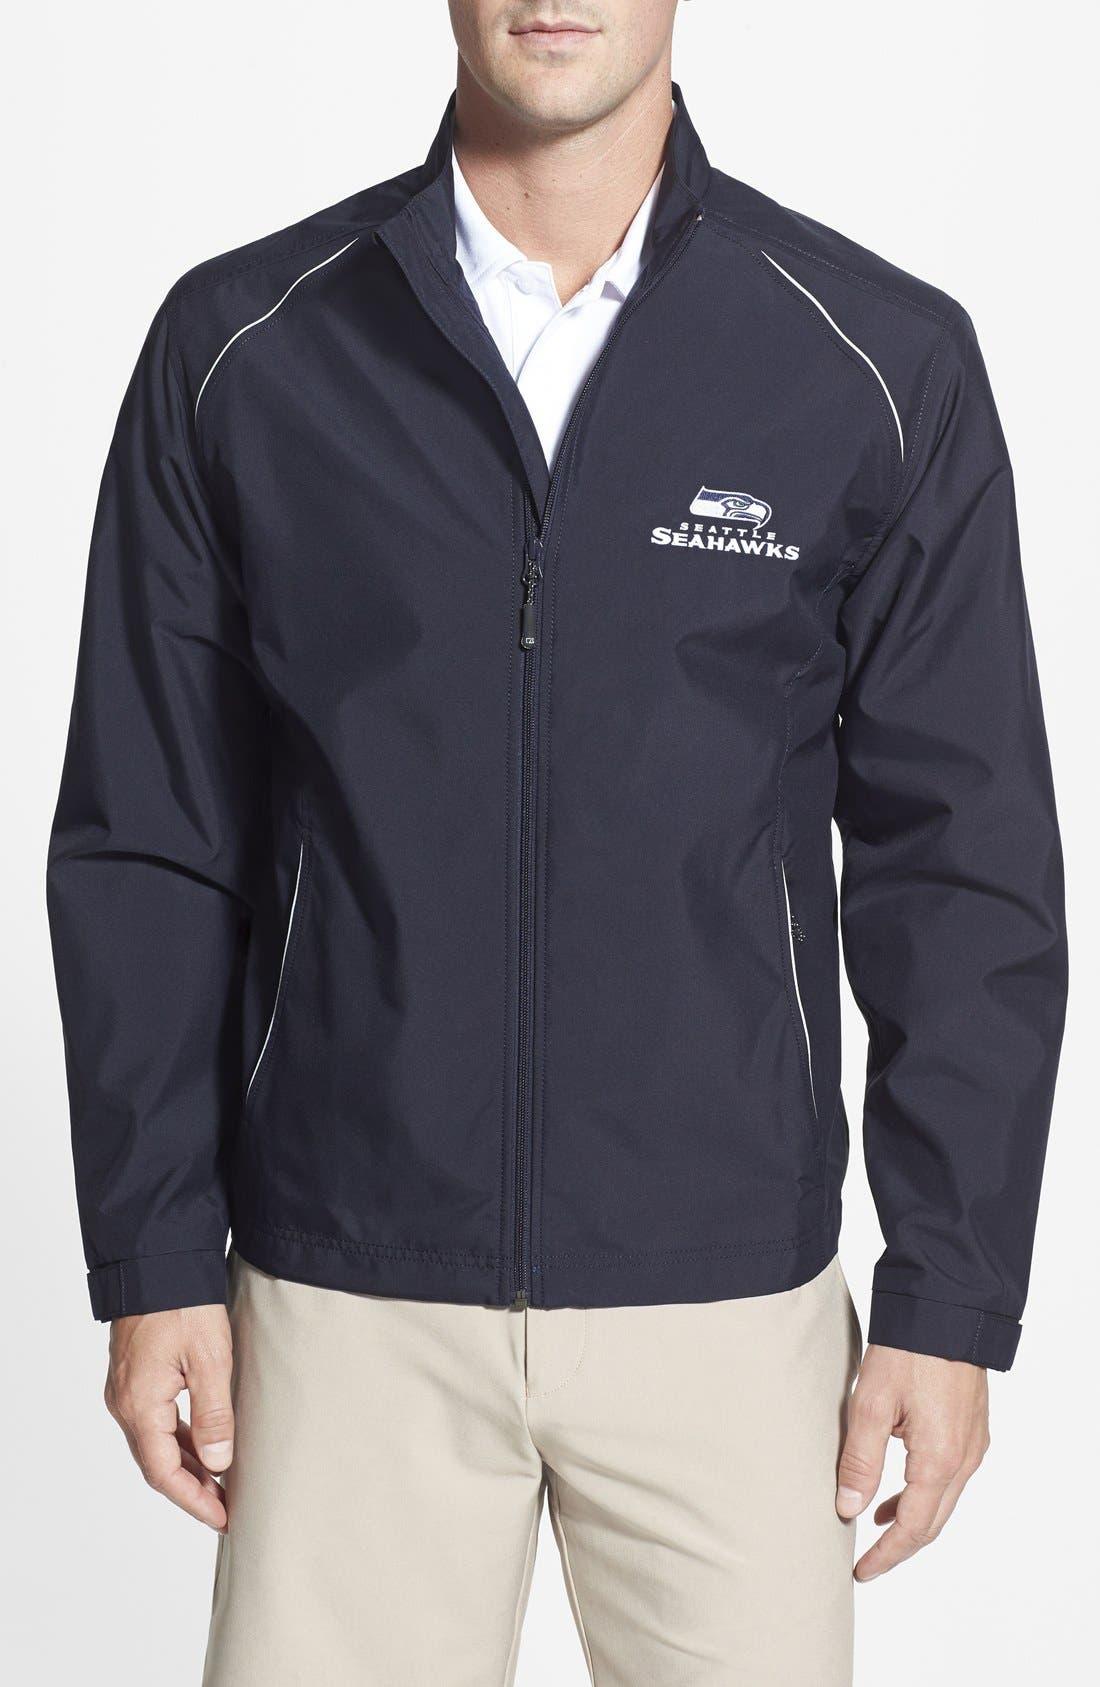 Seattle Seahawks - Beacon WeatherTec Wind & Water Resistant Jacket,                             Main thumbnail 1, color,                             420